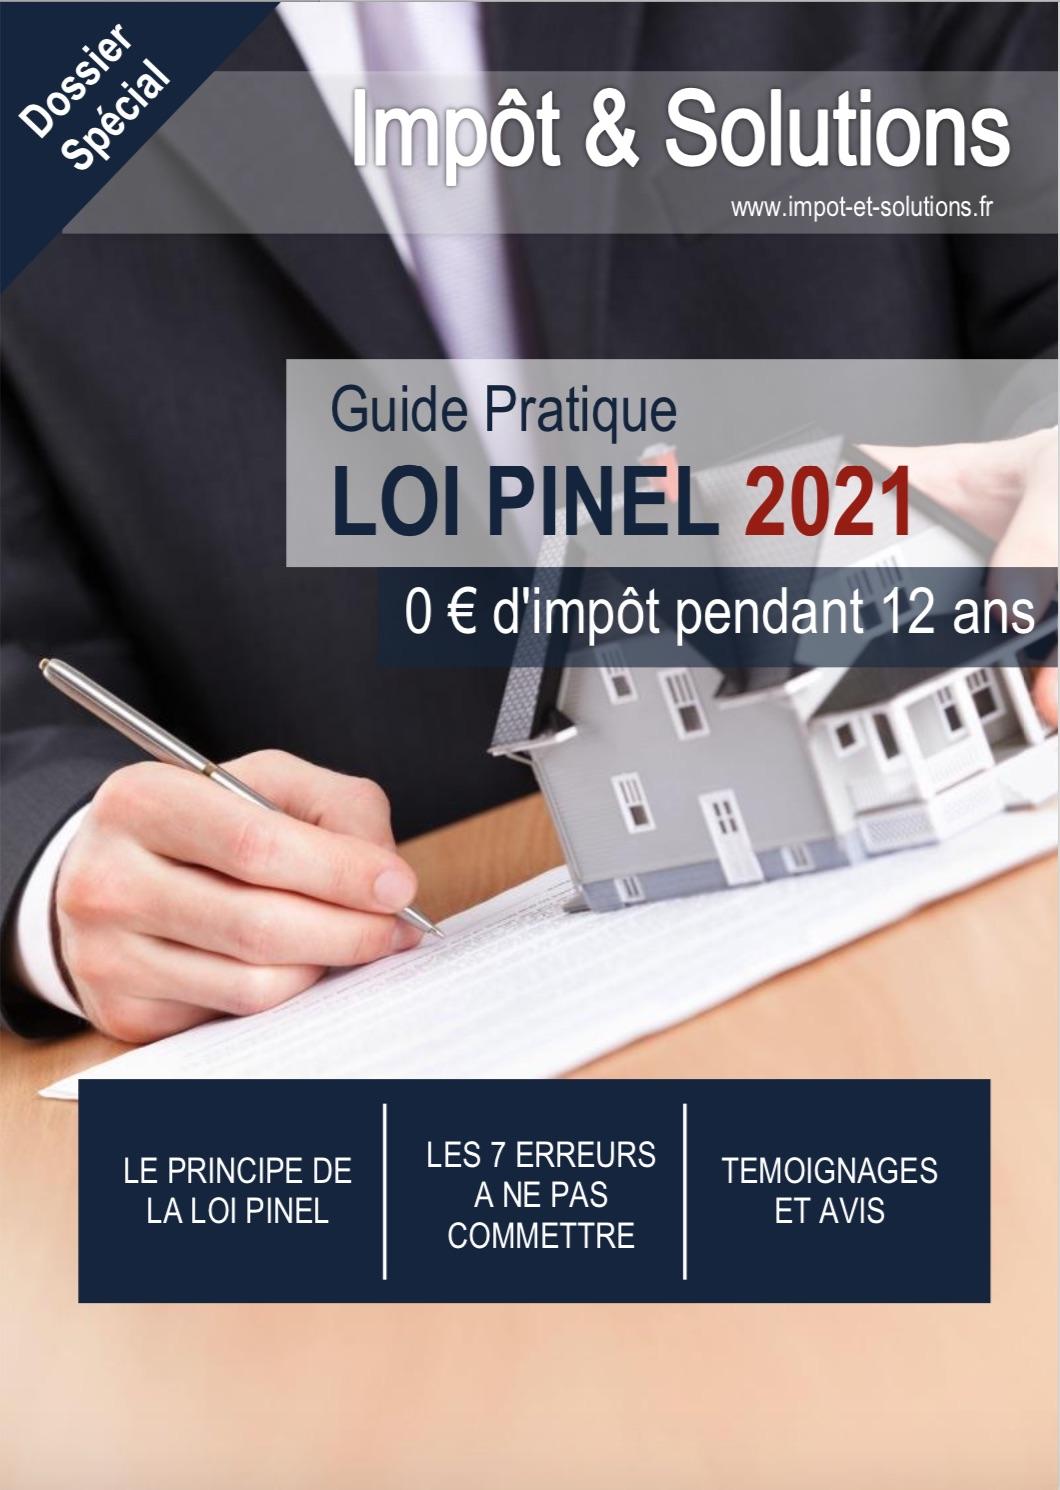 Guide de la Loi Pinel 2021